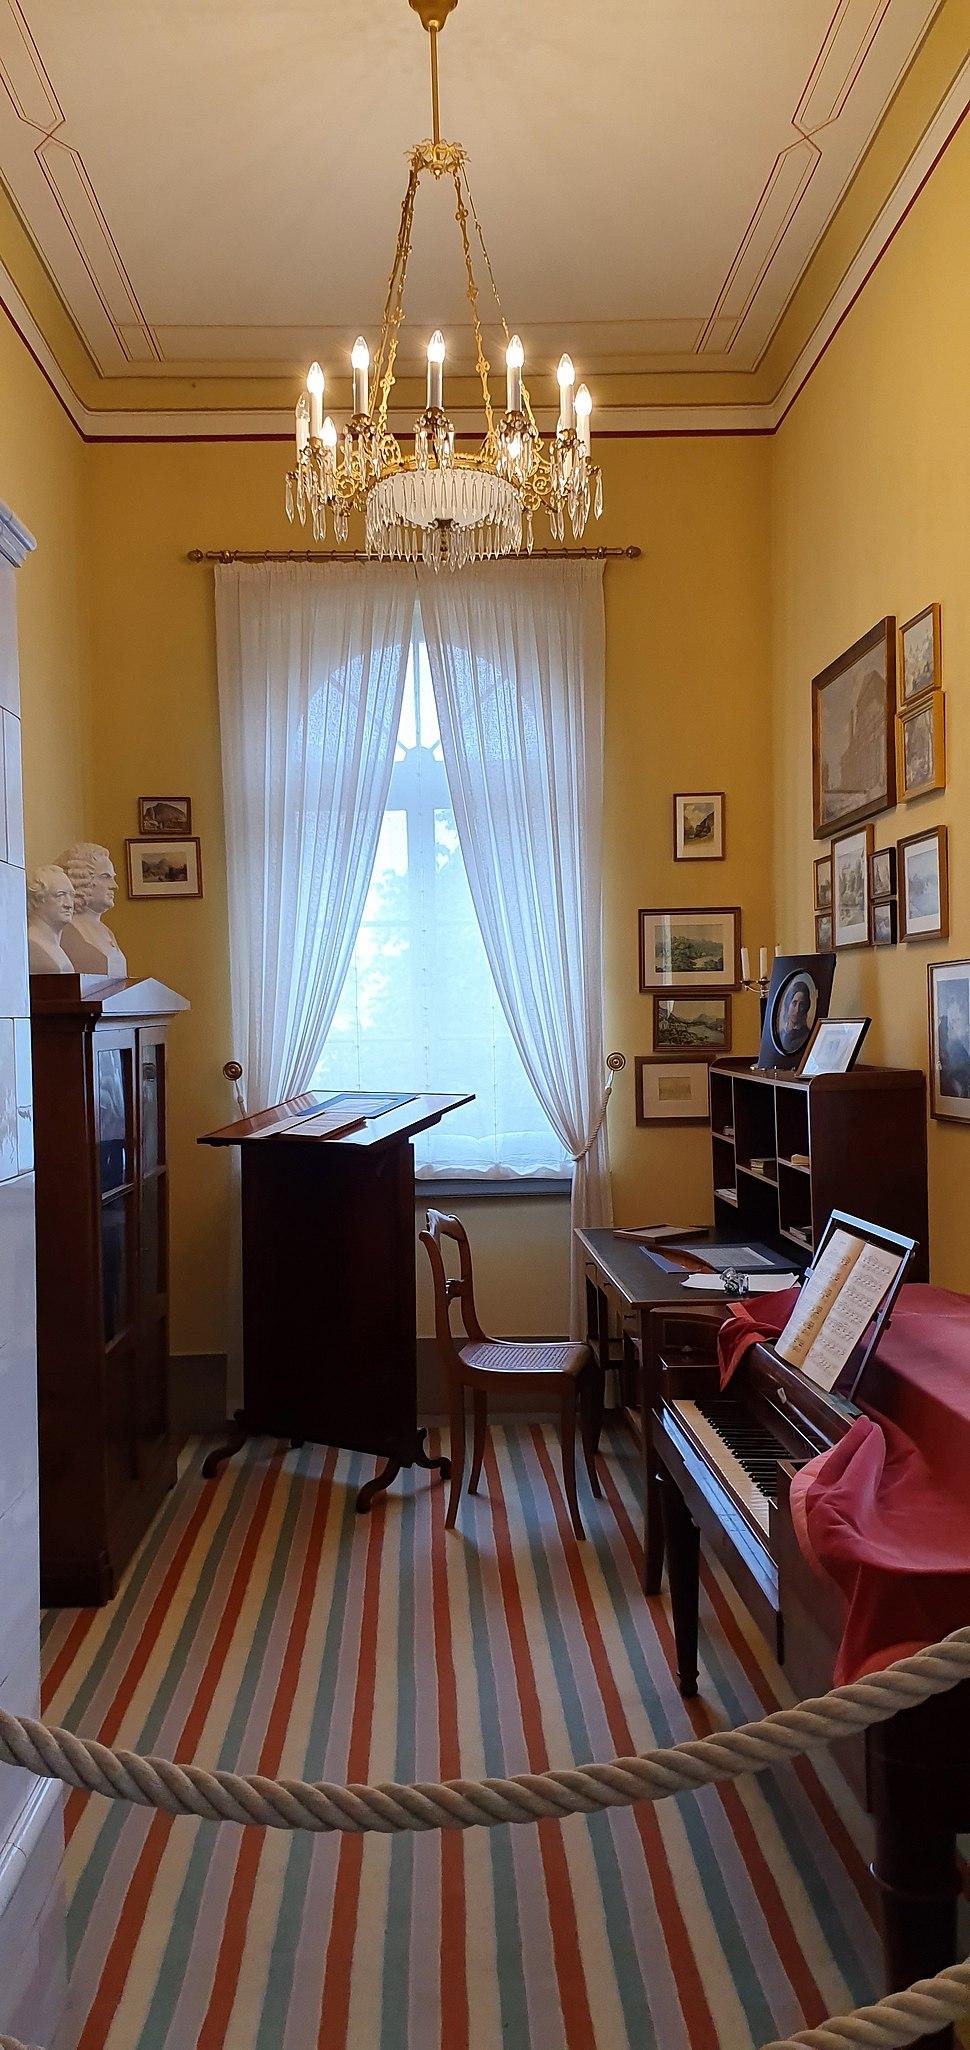 Felix Mendelssohn Leipzig study-Contemporary view